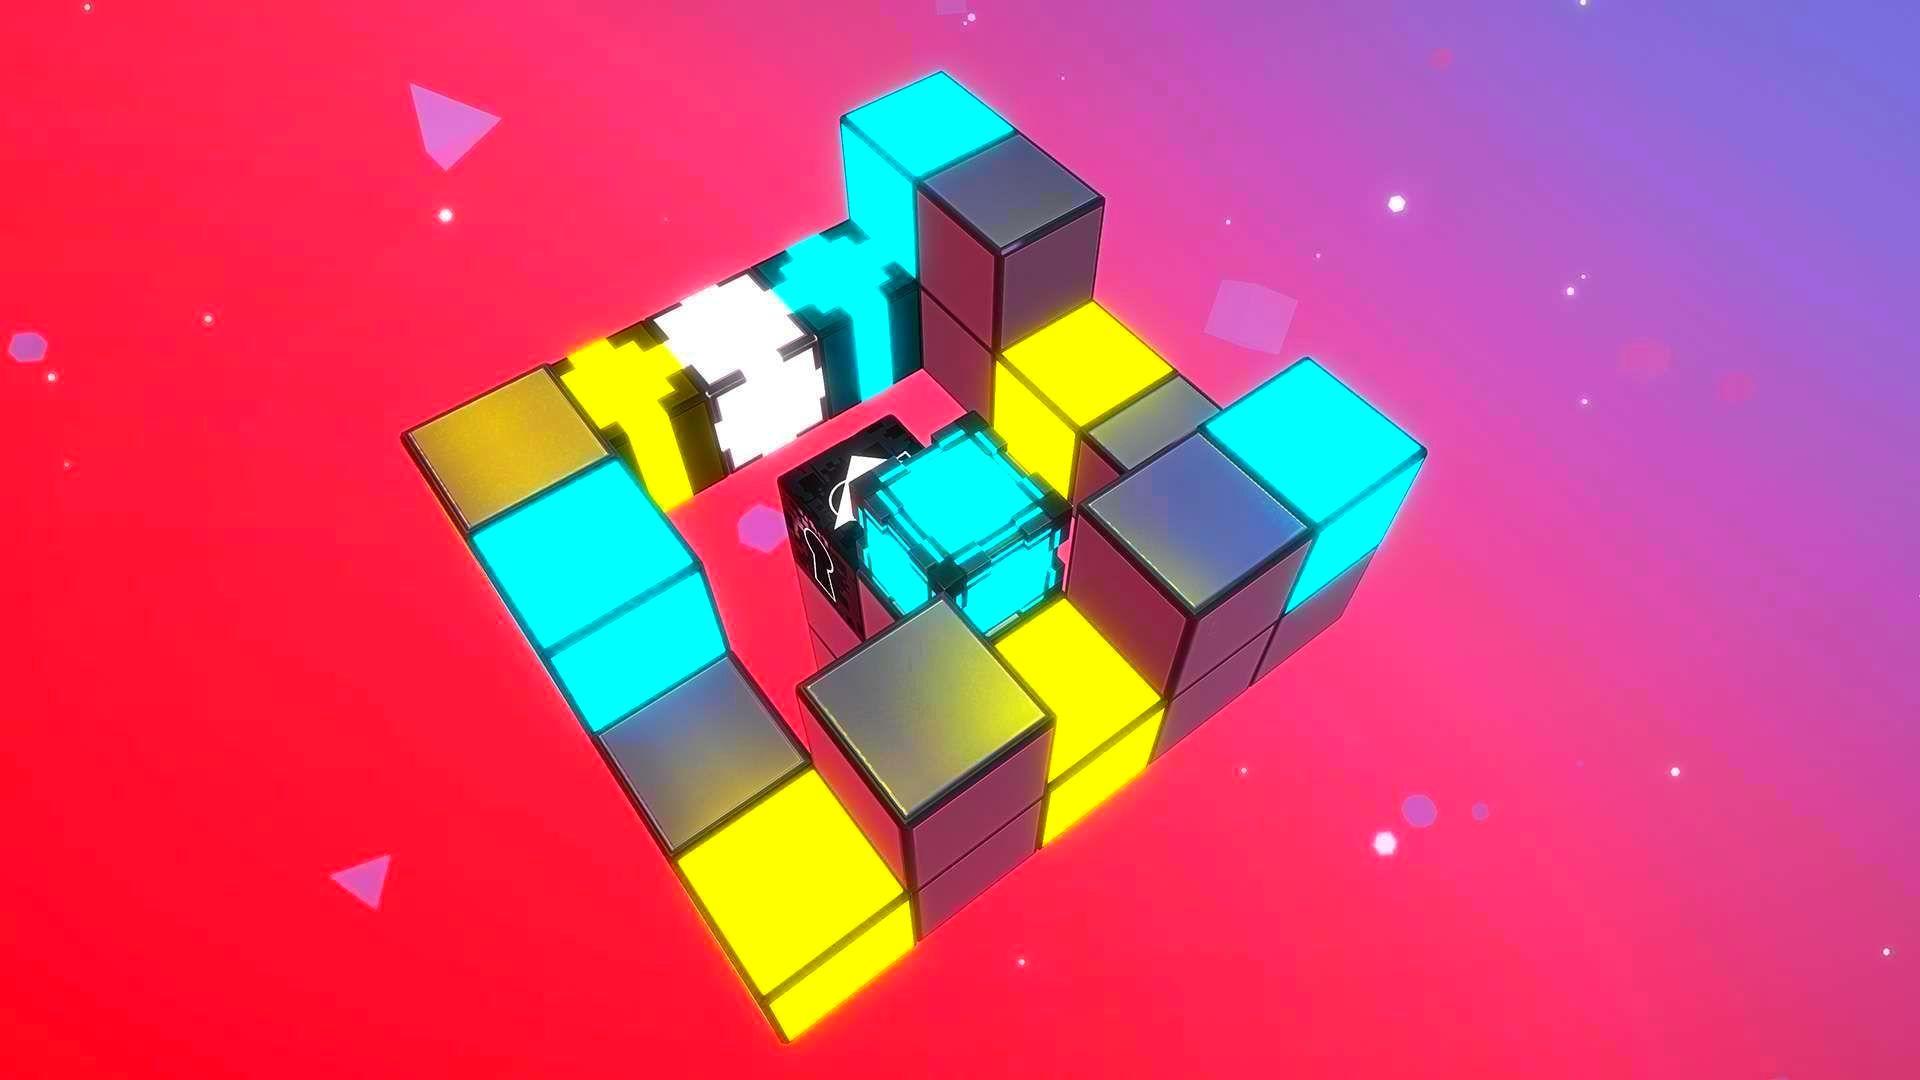 fractalbox_cubikolor_screen_04.jpg